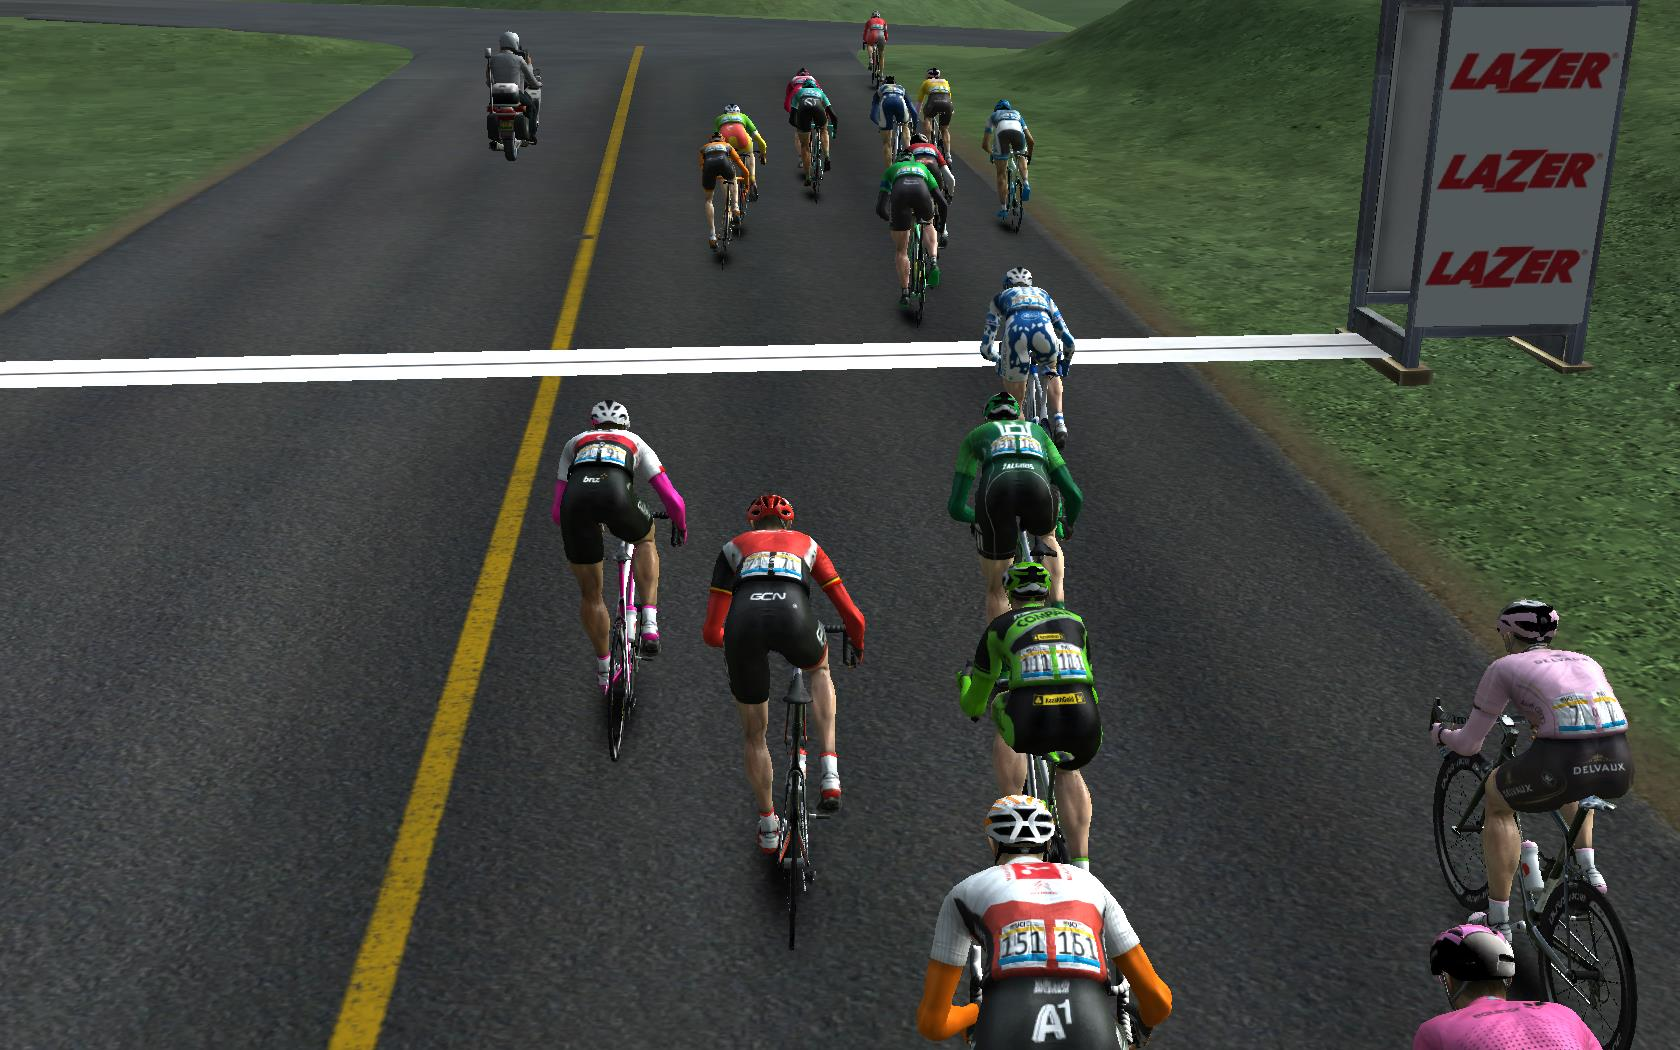 pcmdaily.com/images/mg/2018/Races/C2/USAPCC/3/PCM0013.jpg